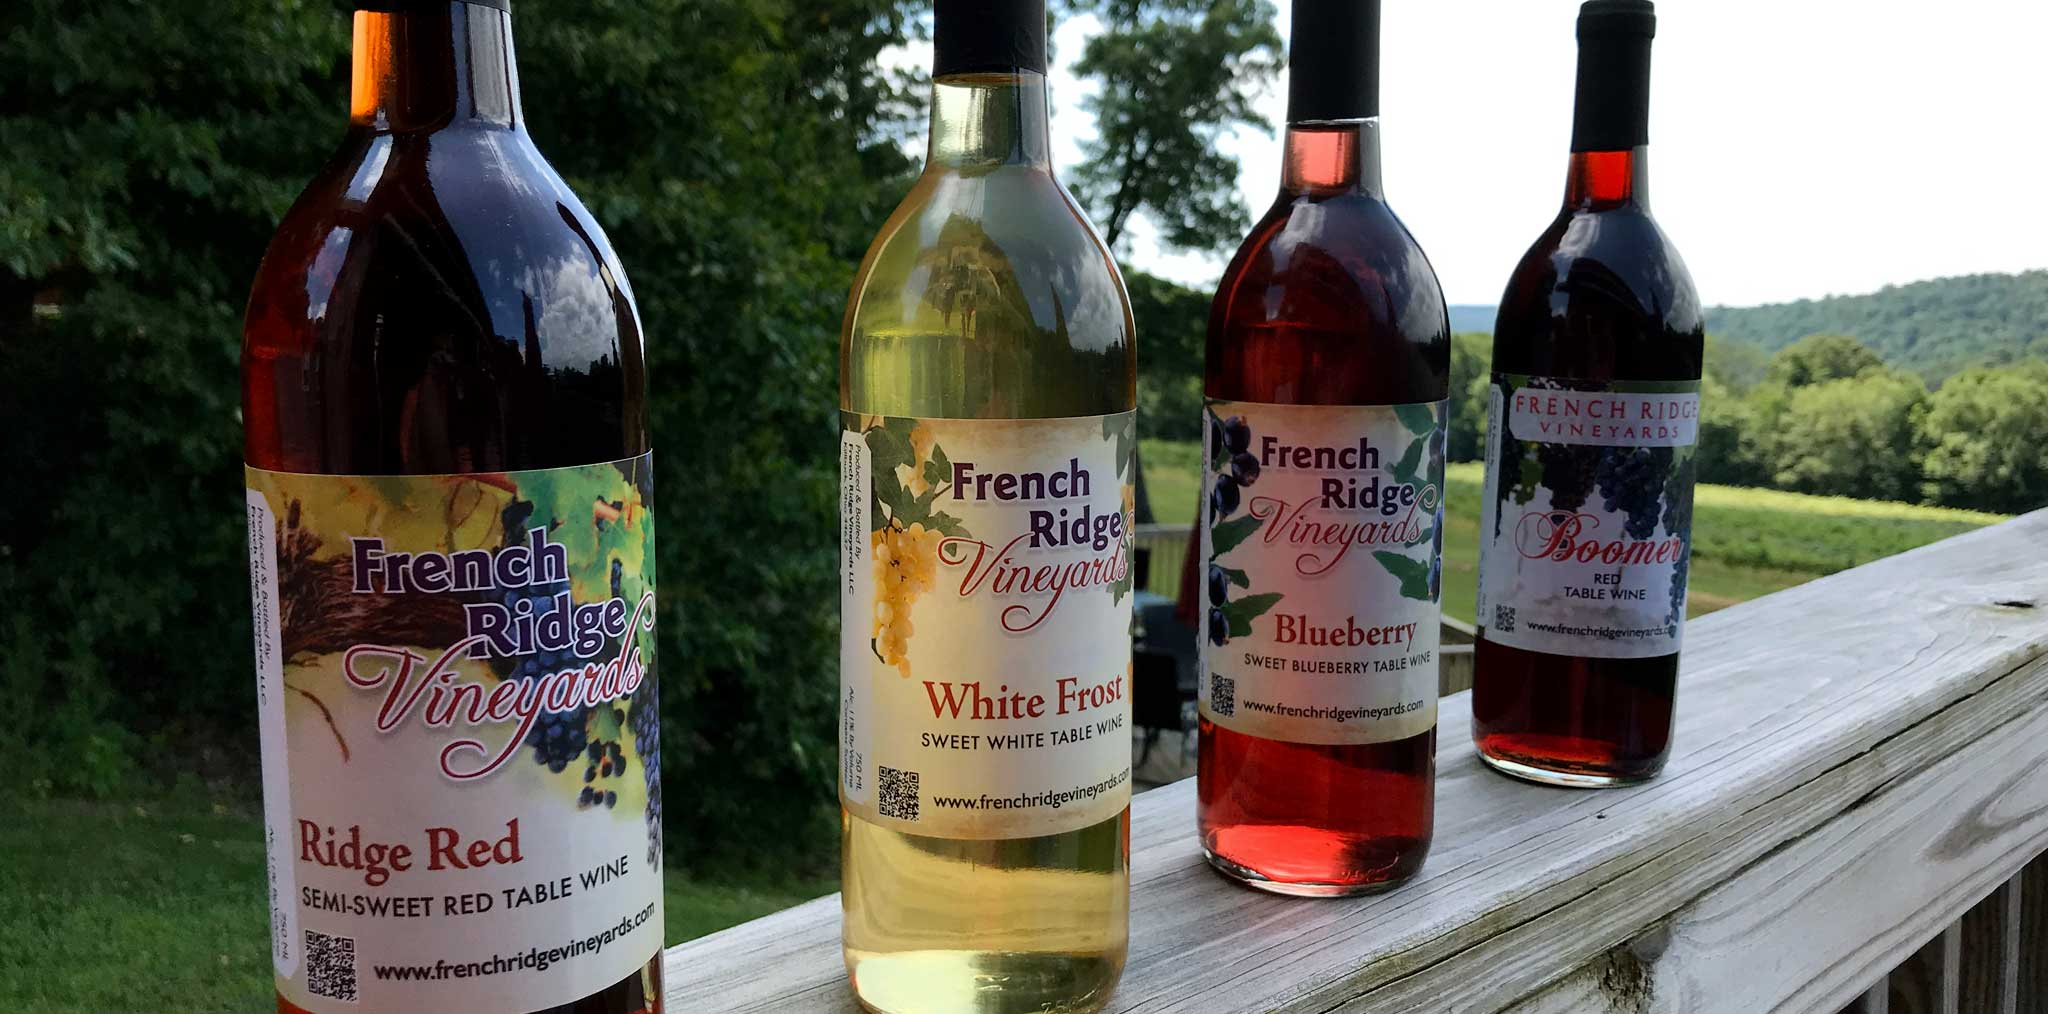 French Ridge Vineyards —Wine Varieties